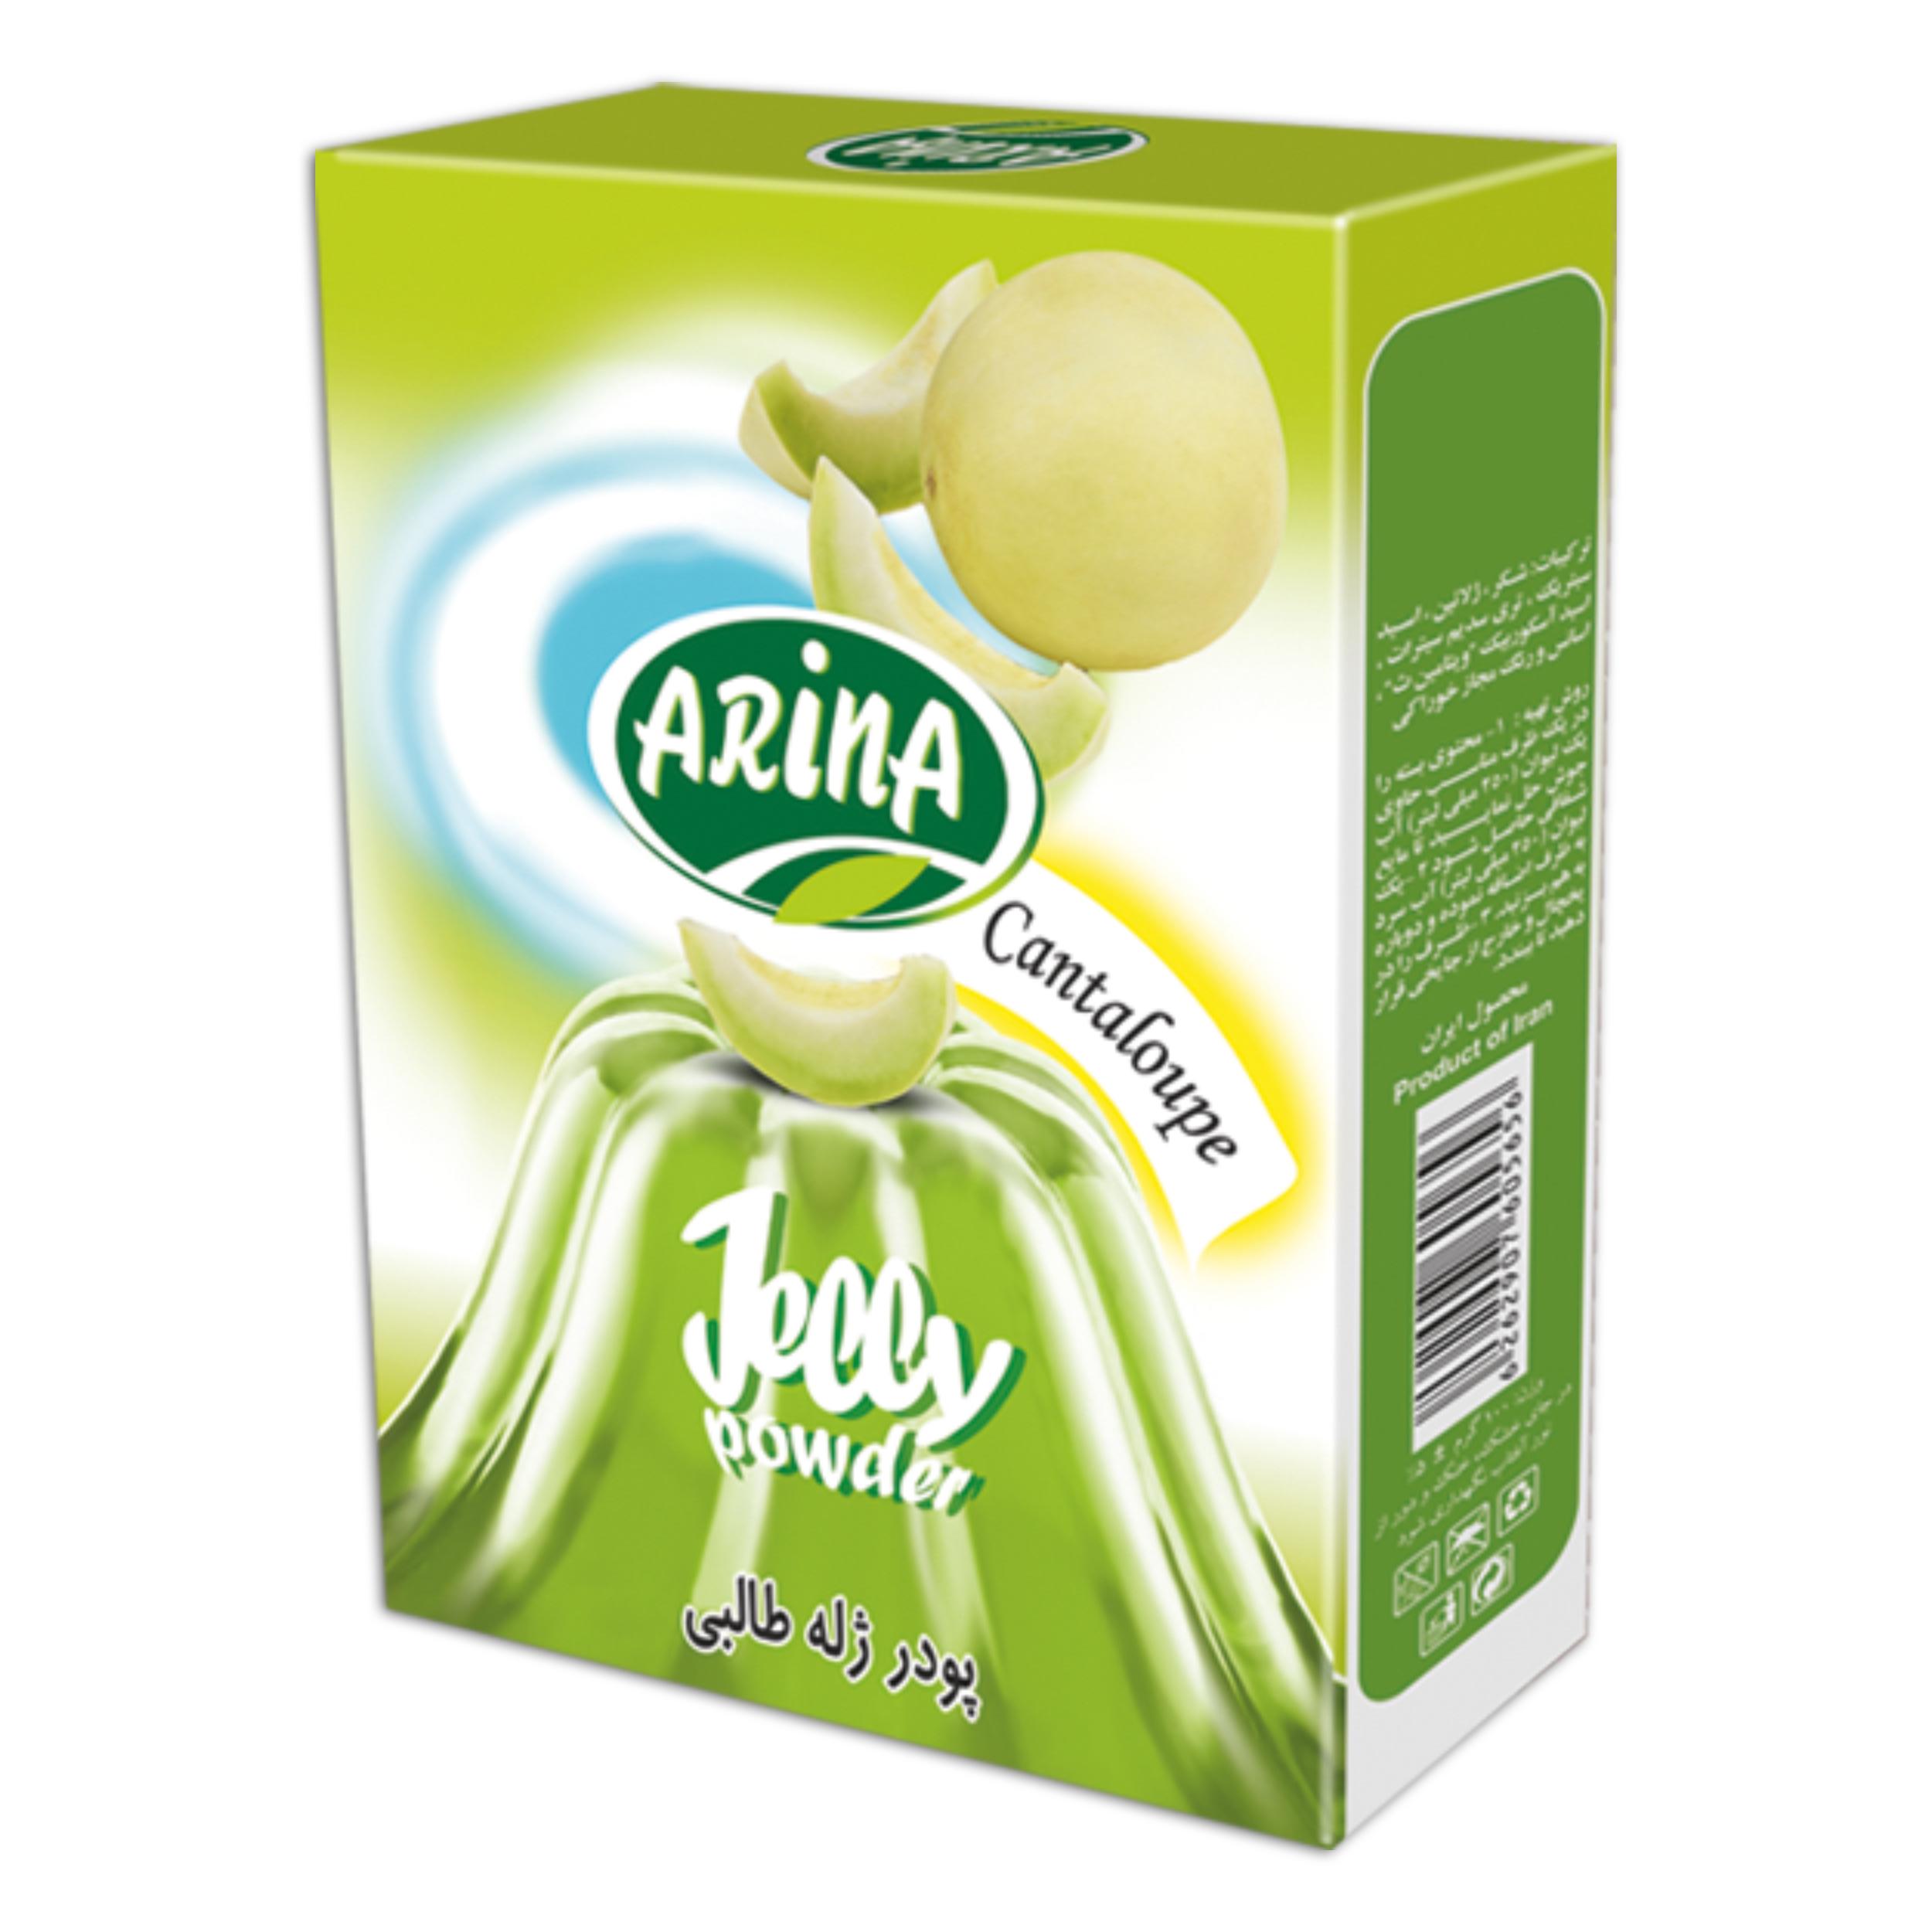 پودر ژله طالبی آرینا - 100 گرم